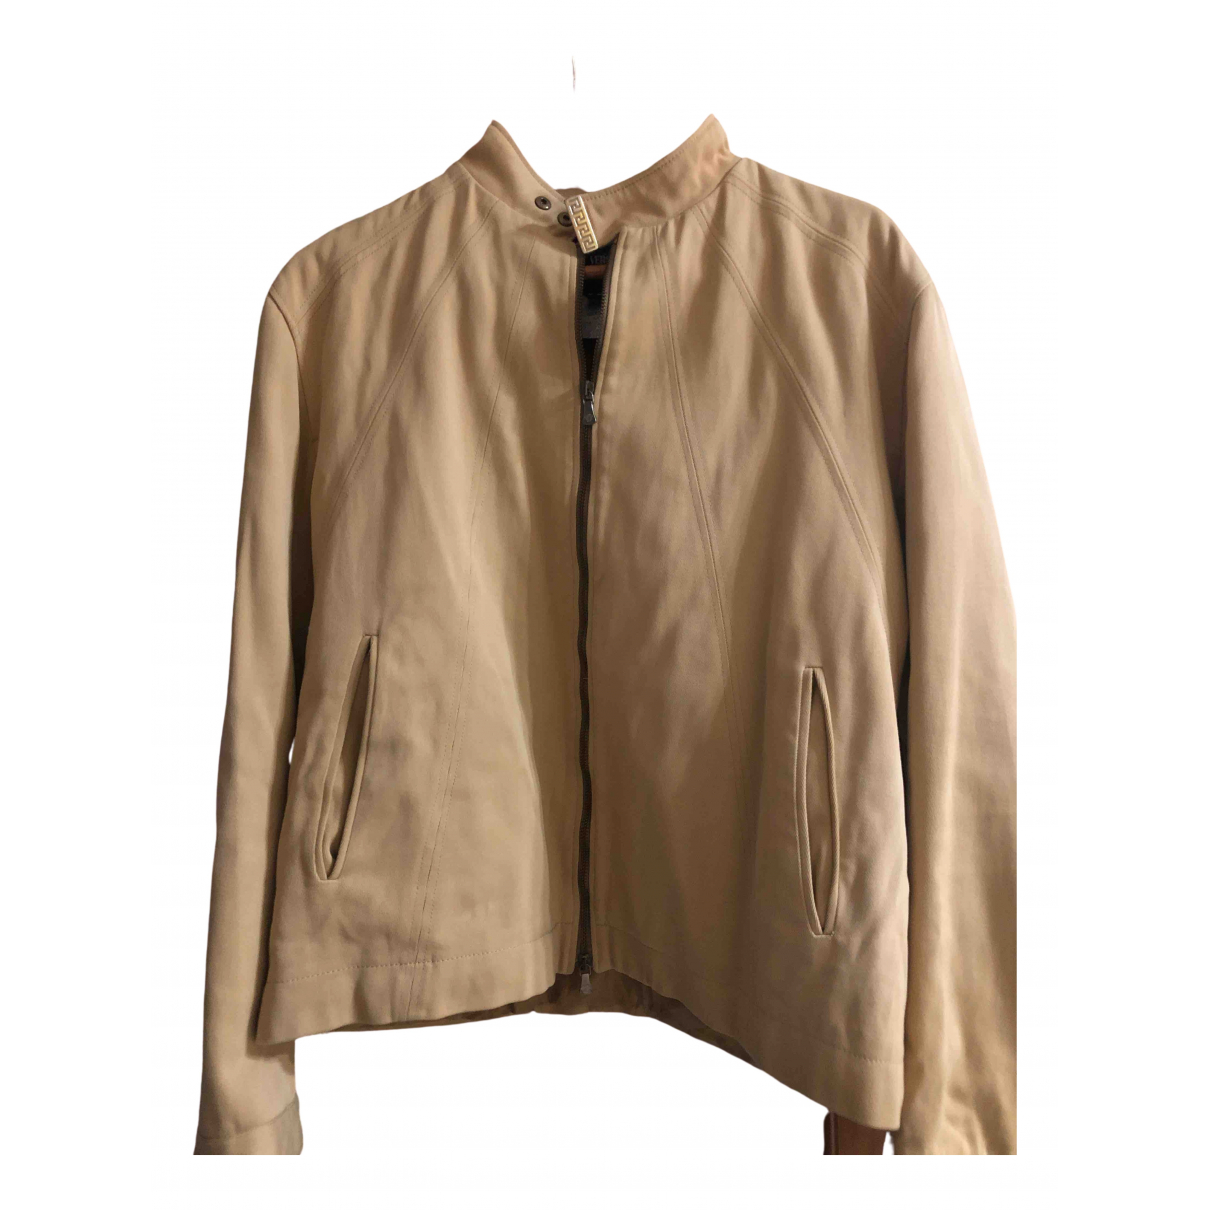 Versace Jeans \N Beige Denim - Jeans jacket  for Men XXL International